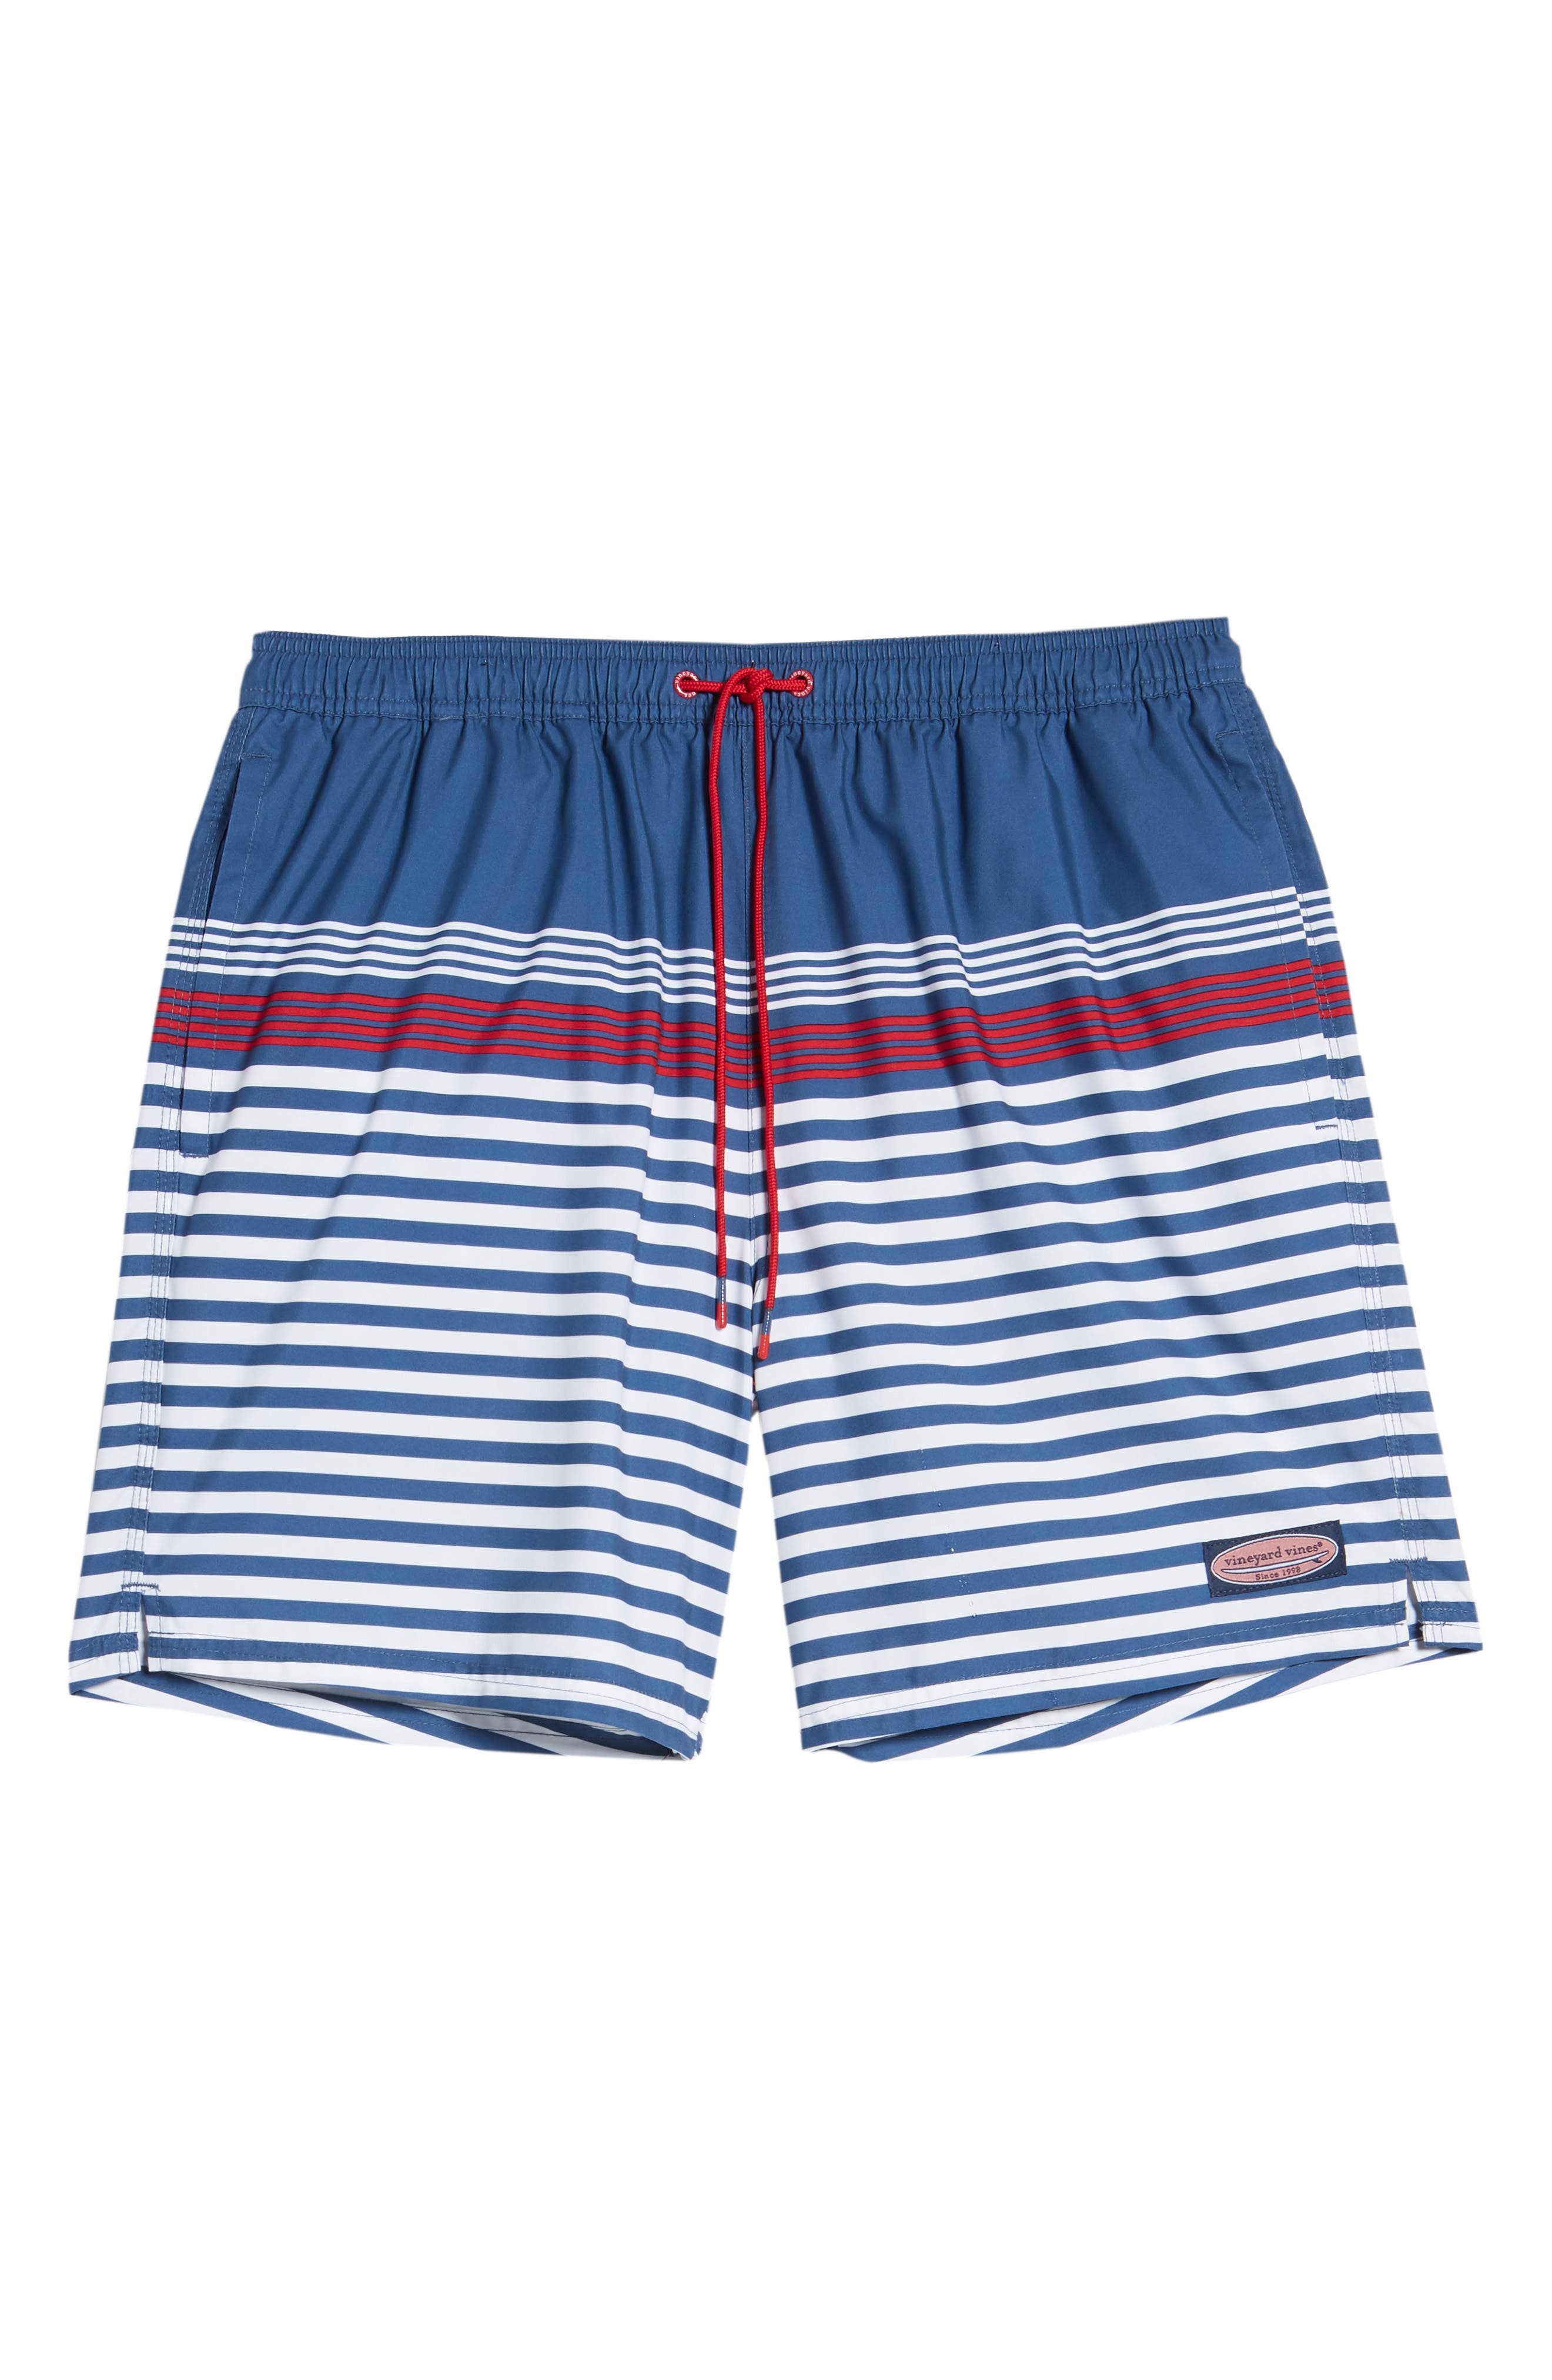 Chappy Summerall Stripe Swim Trunks,                             Alternate thumbnail 6, color,                             MOONSHINE